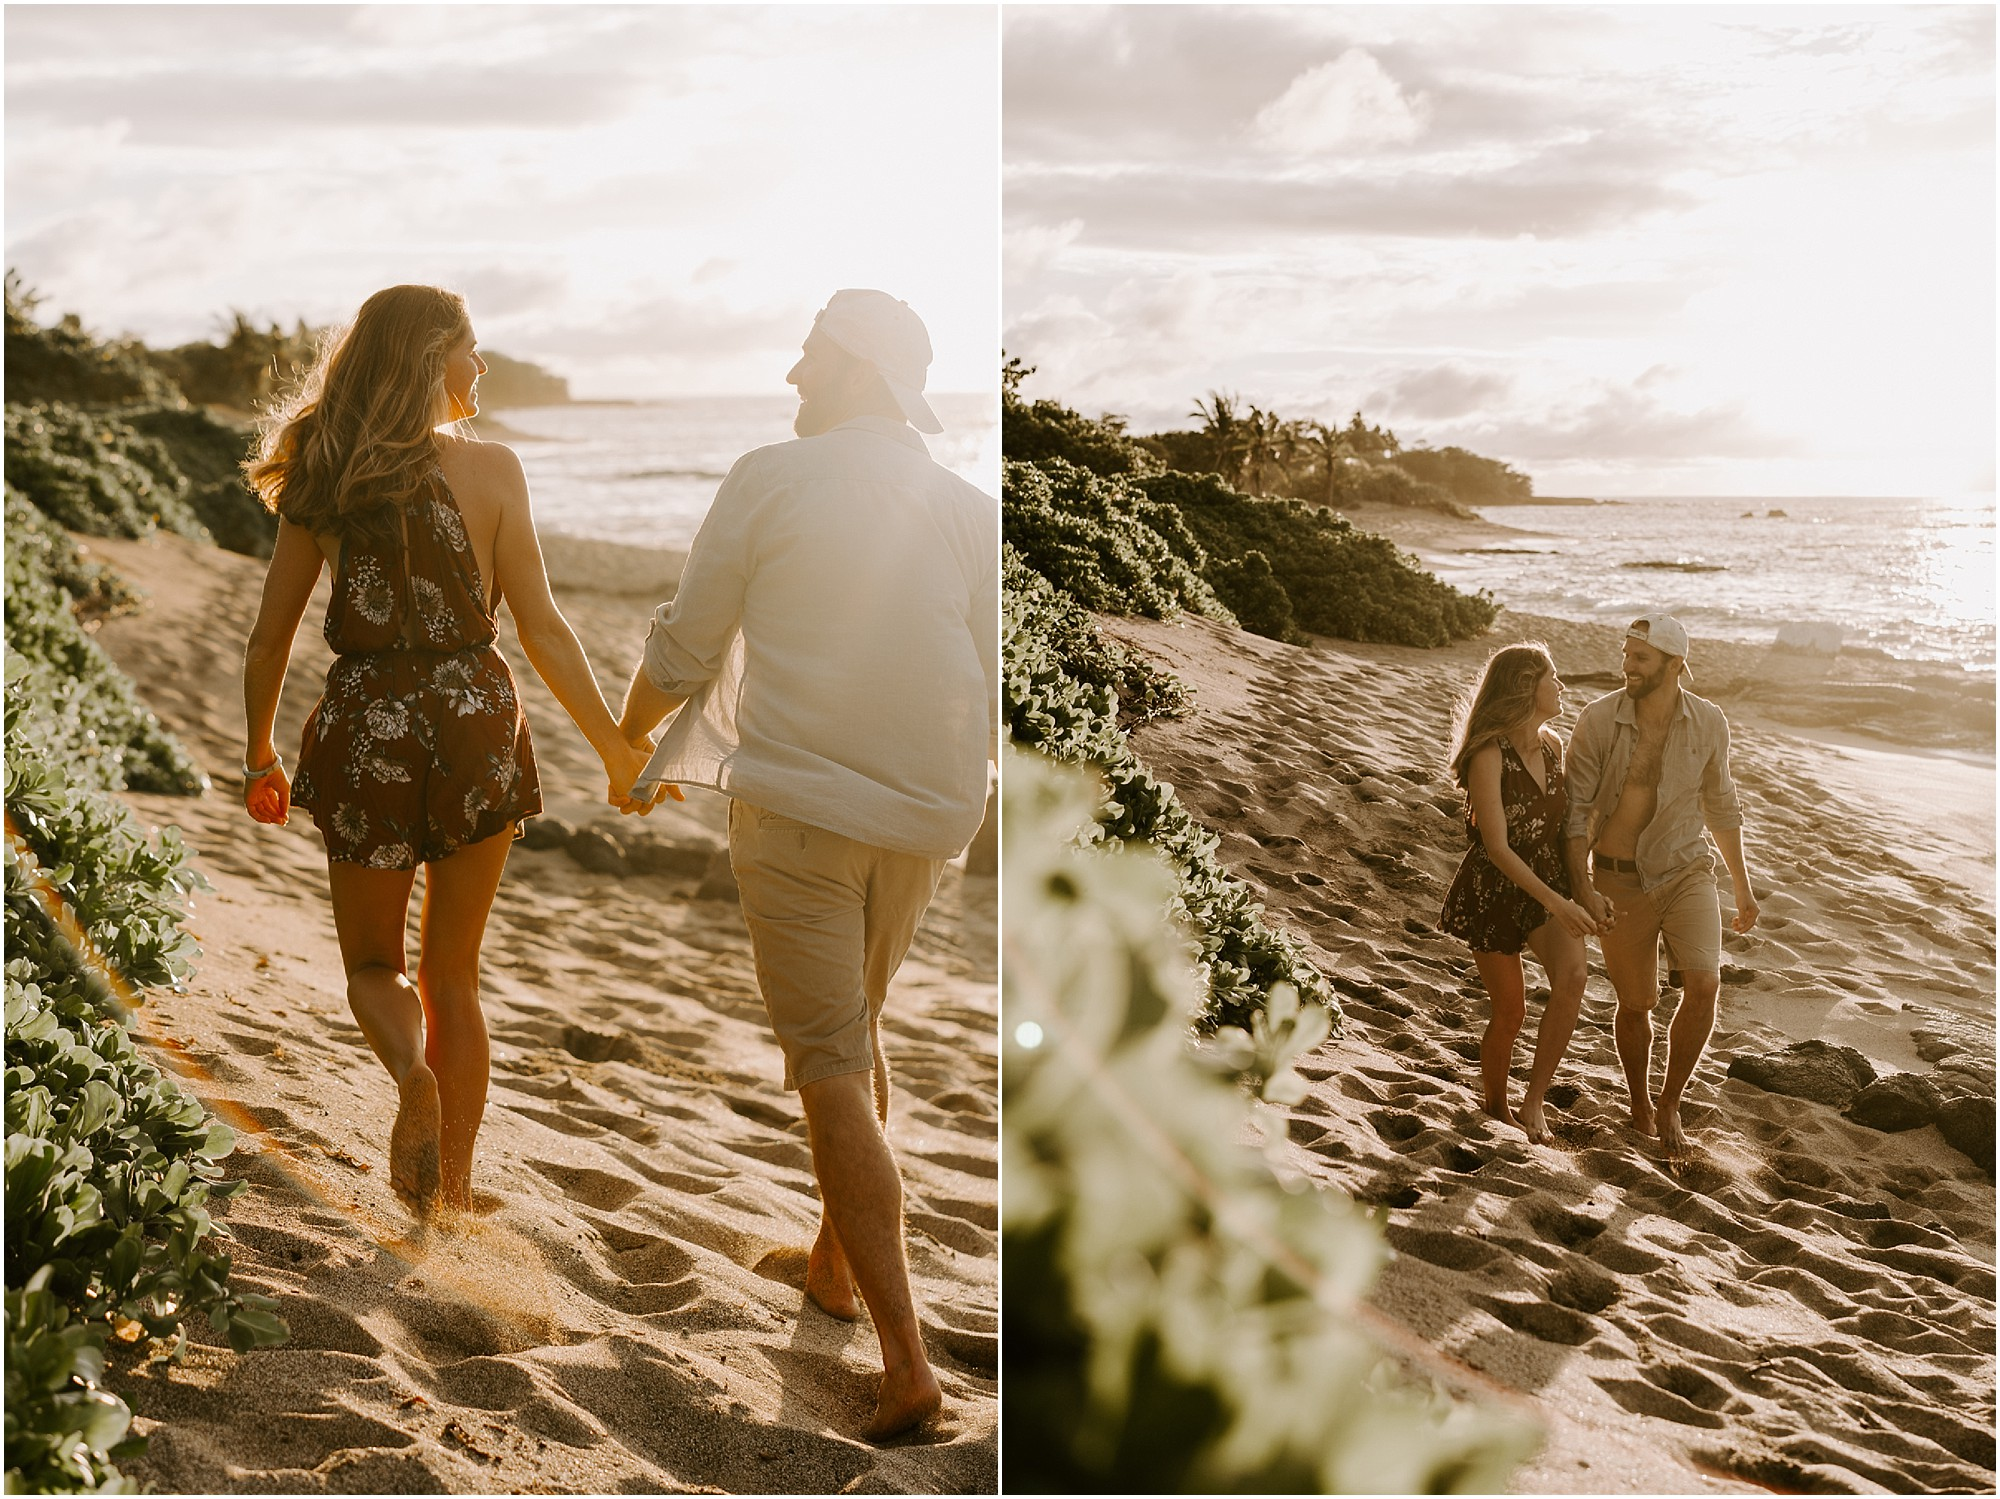 destination-elopement-photography-hawaii-photos-by-aloha-zoe-photography_0011.jpg